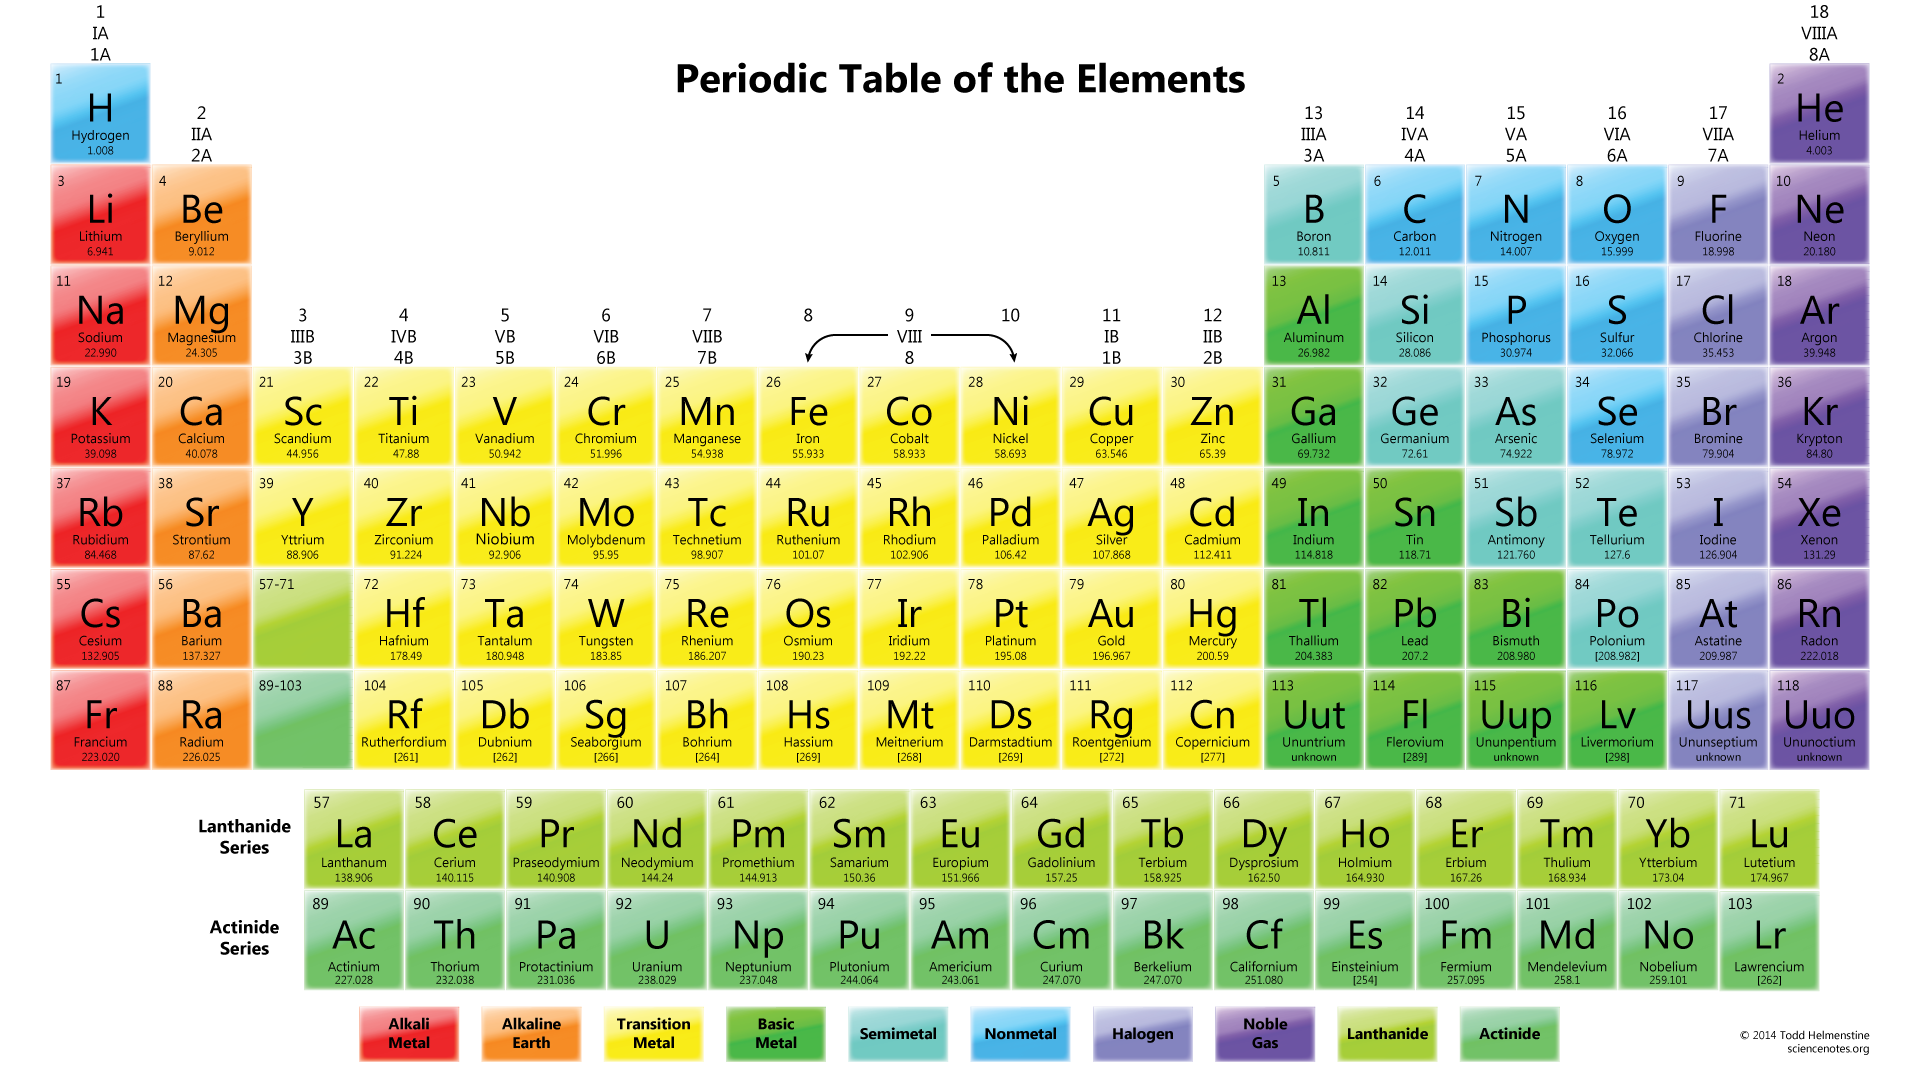 PeriodicTable chemistry